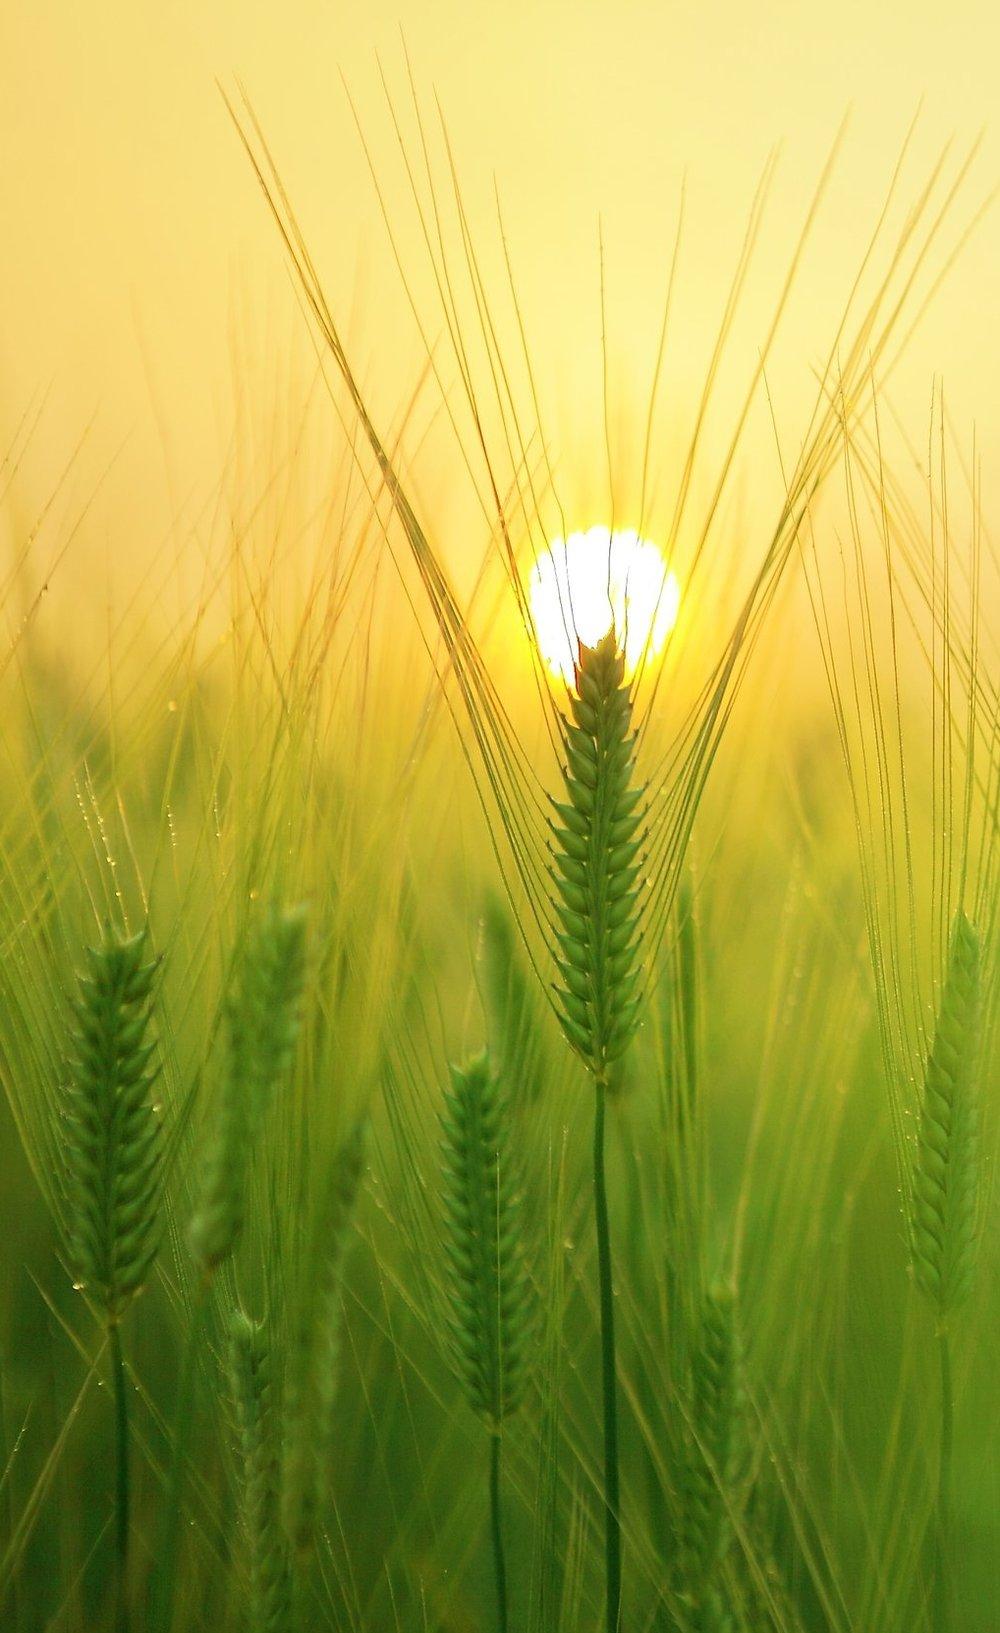 barley-field-1684052.jpg